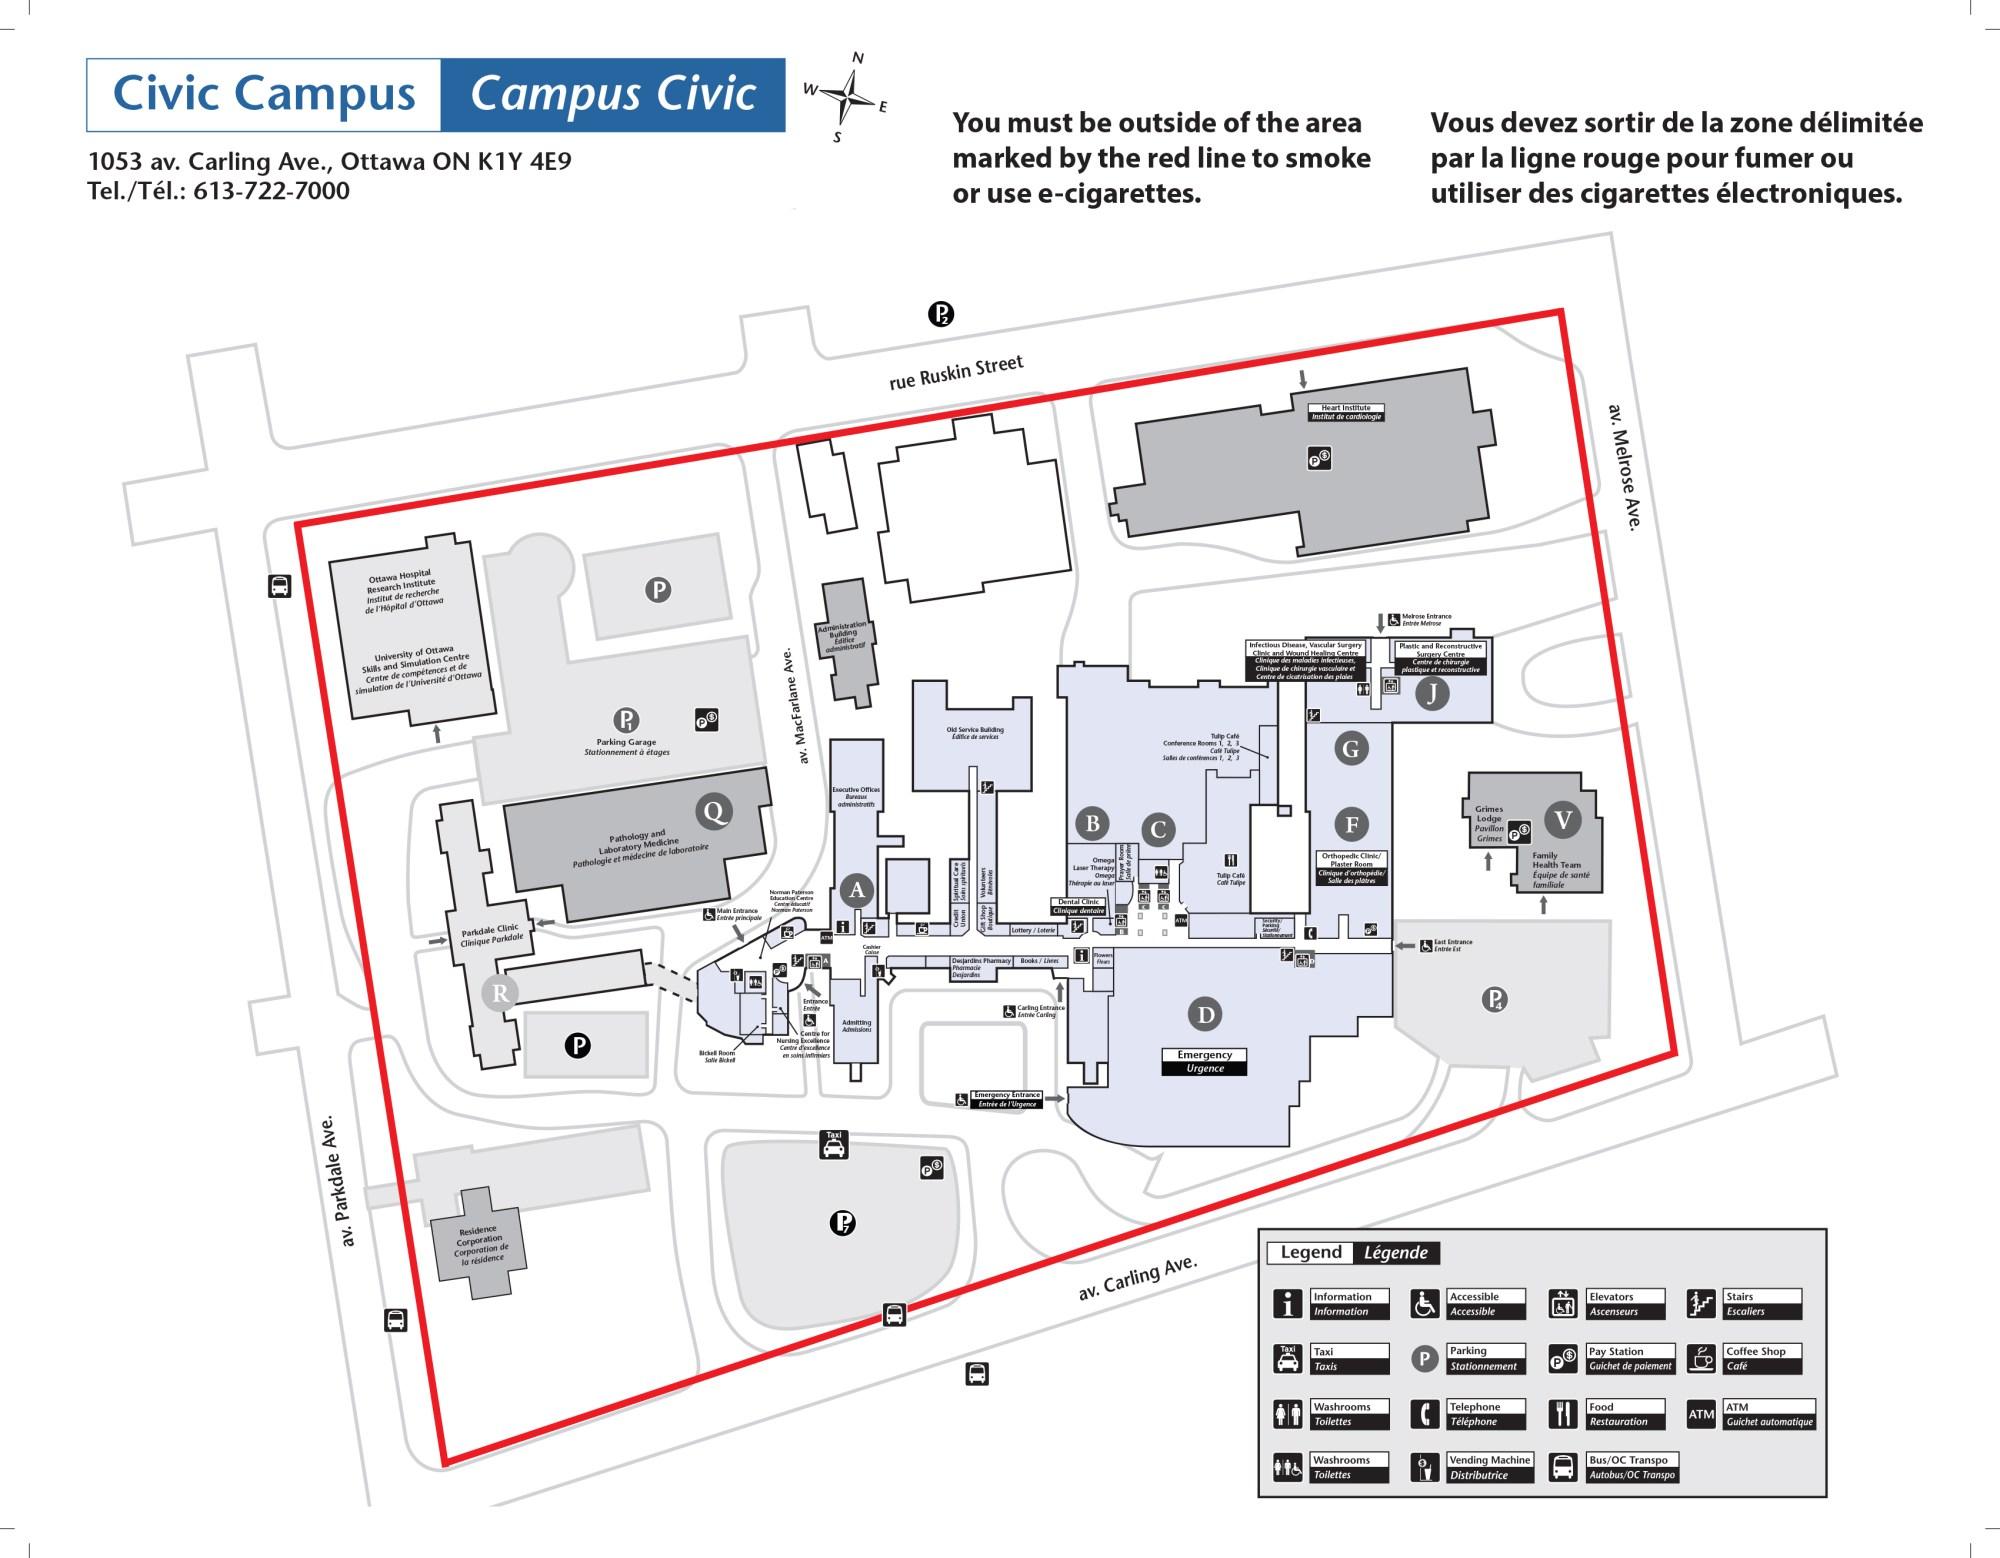 hight resolution of main floor civic campus level 1 civic campus level 2 civic campus level 3 civic campus level 4 civic campus level 5 civic campus level 6